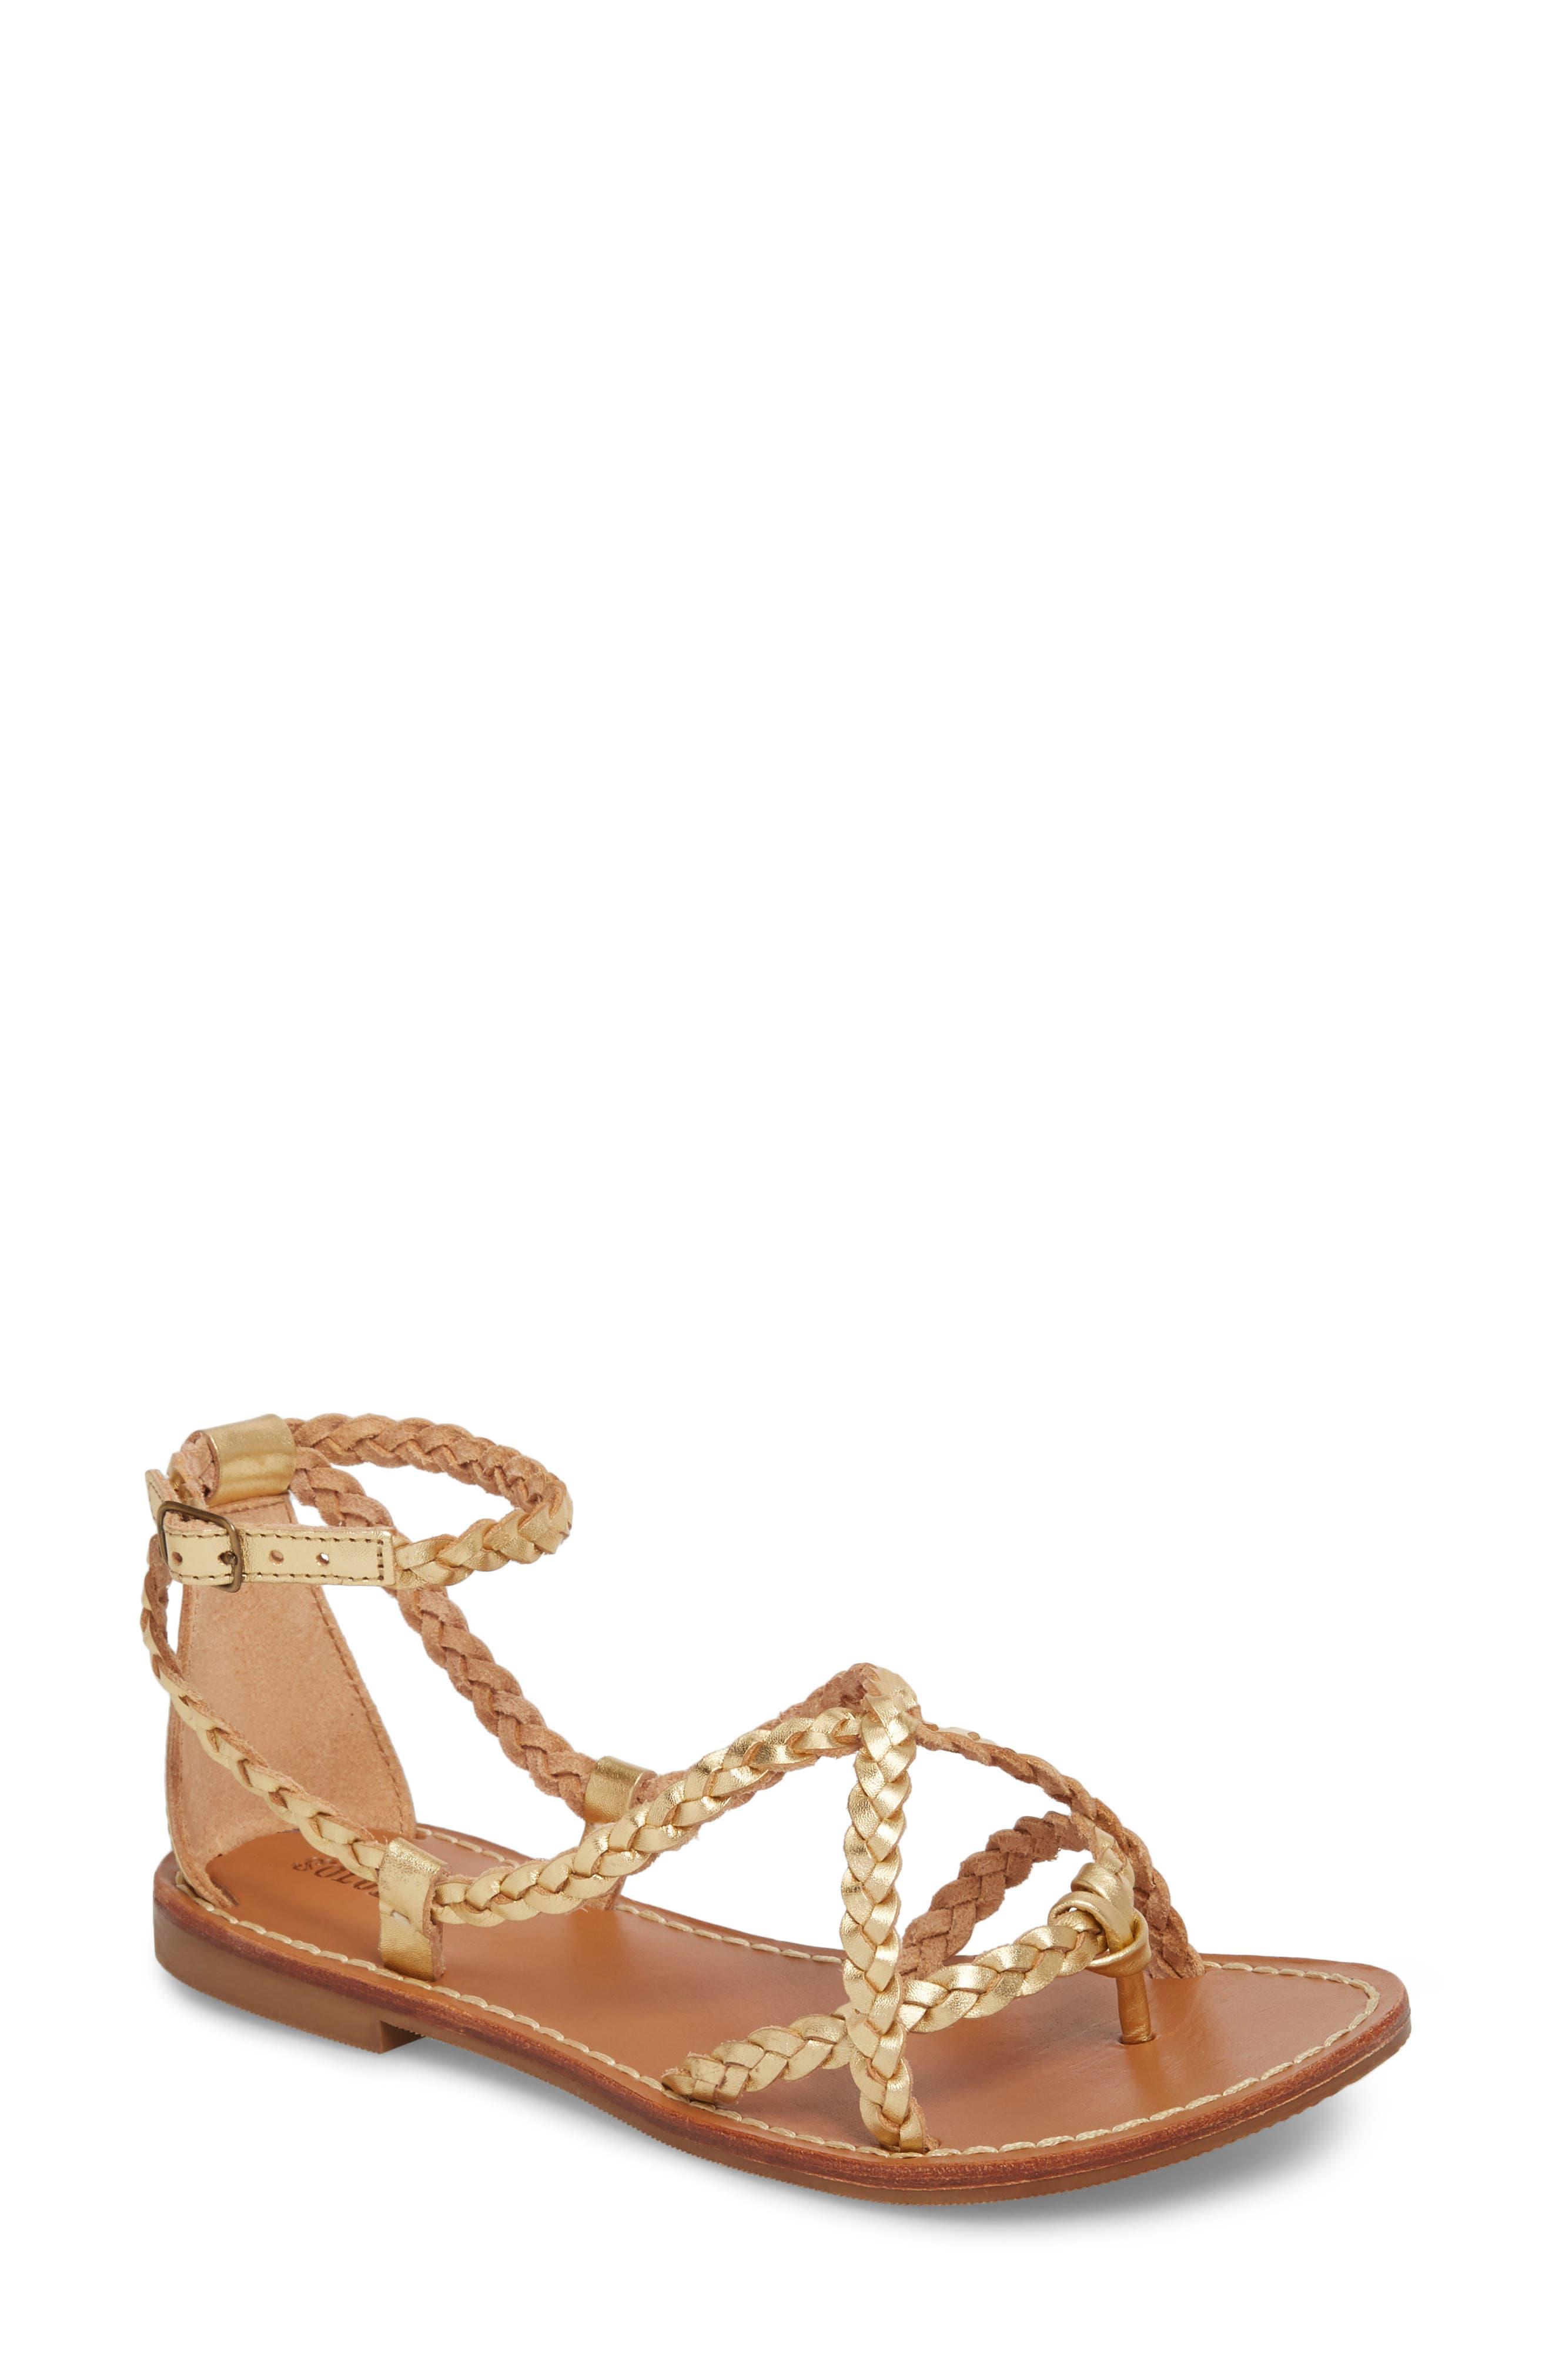 Amalfi Braided Metallic Sandal,                         Main,                         color, 710